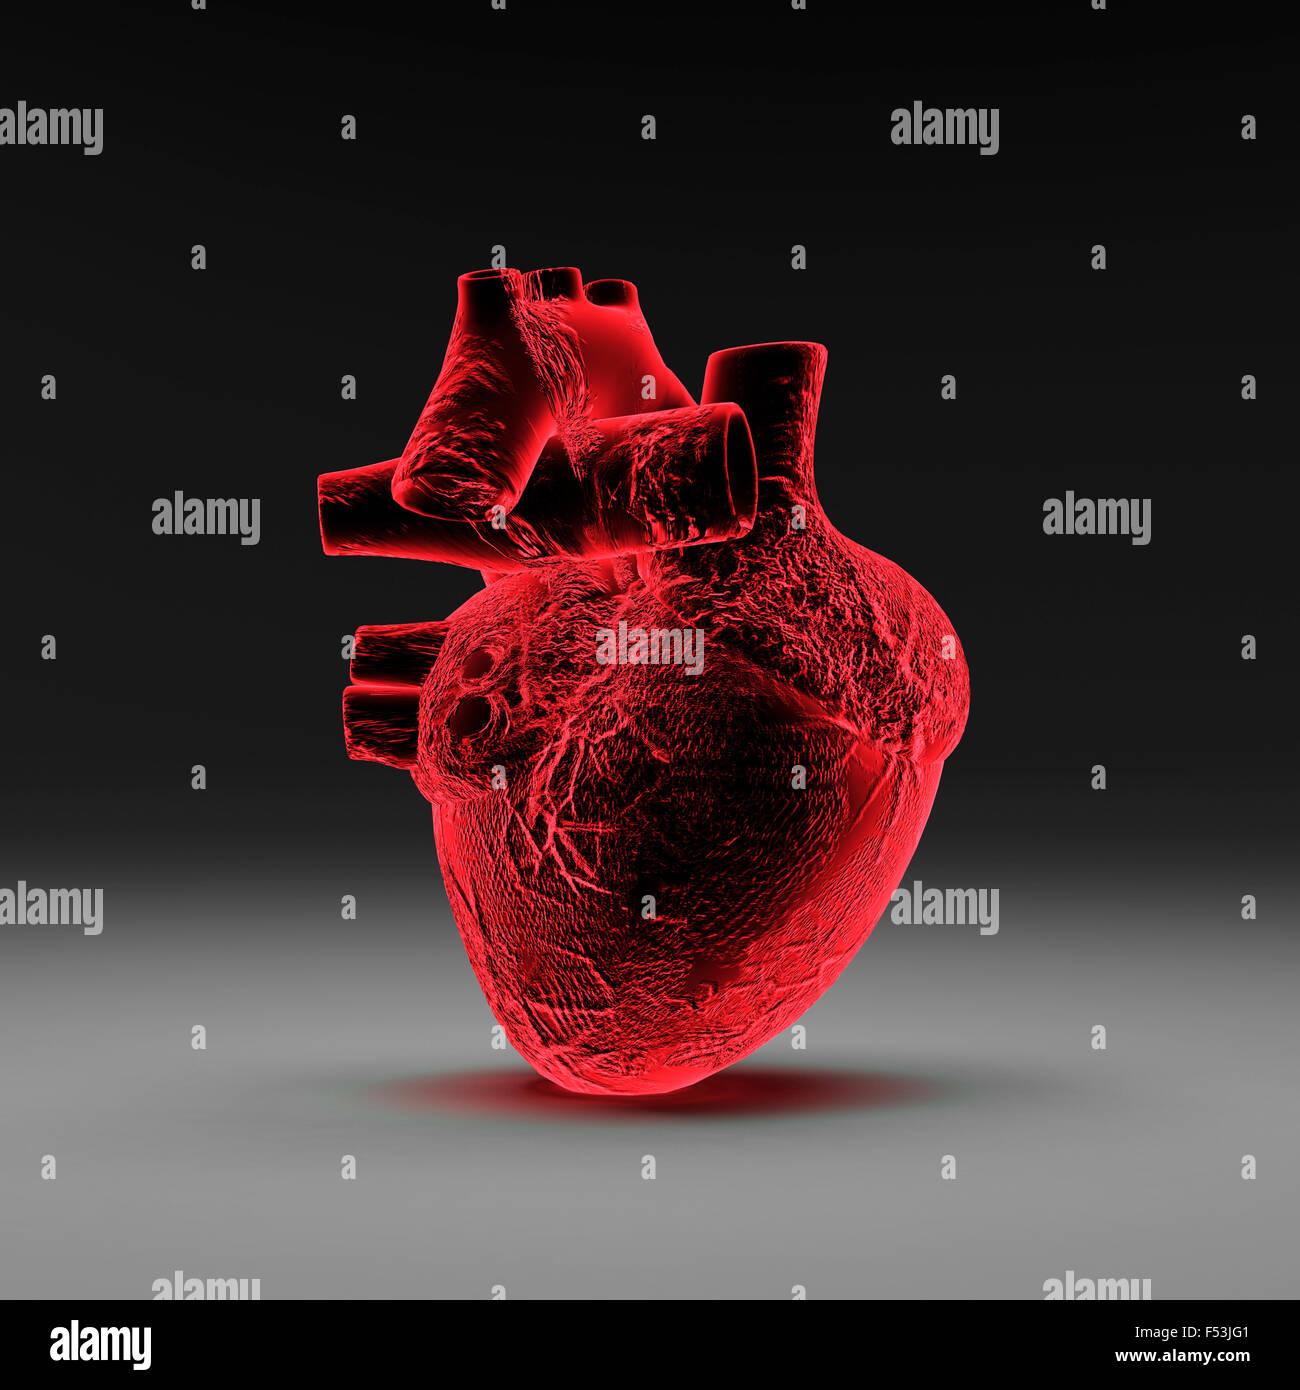 3d, CGI, [M], symbol, heart, medicine, organ, X-ray examination - Stock Image